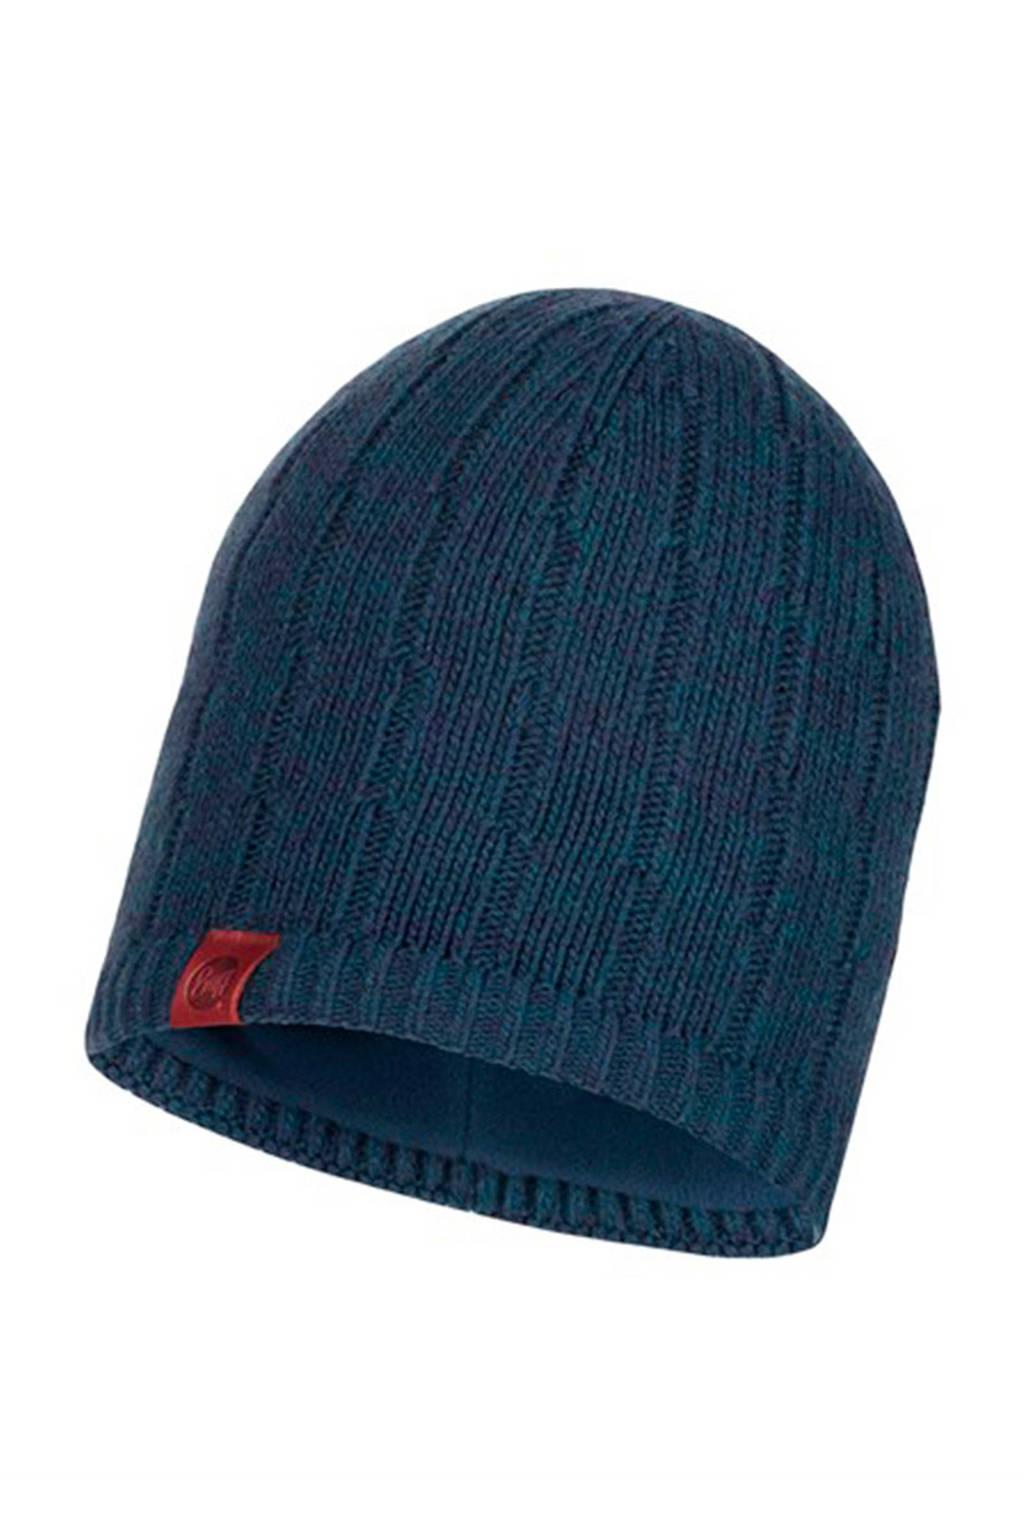 Buff muts Knitted & Polar donkerblauw, Donkerblauw